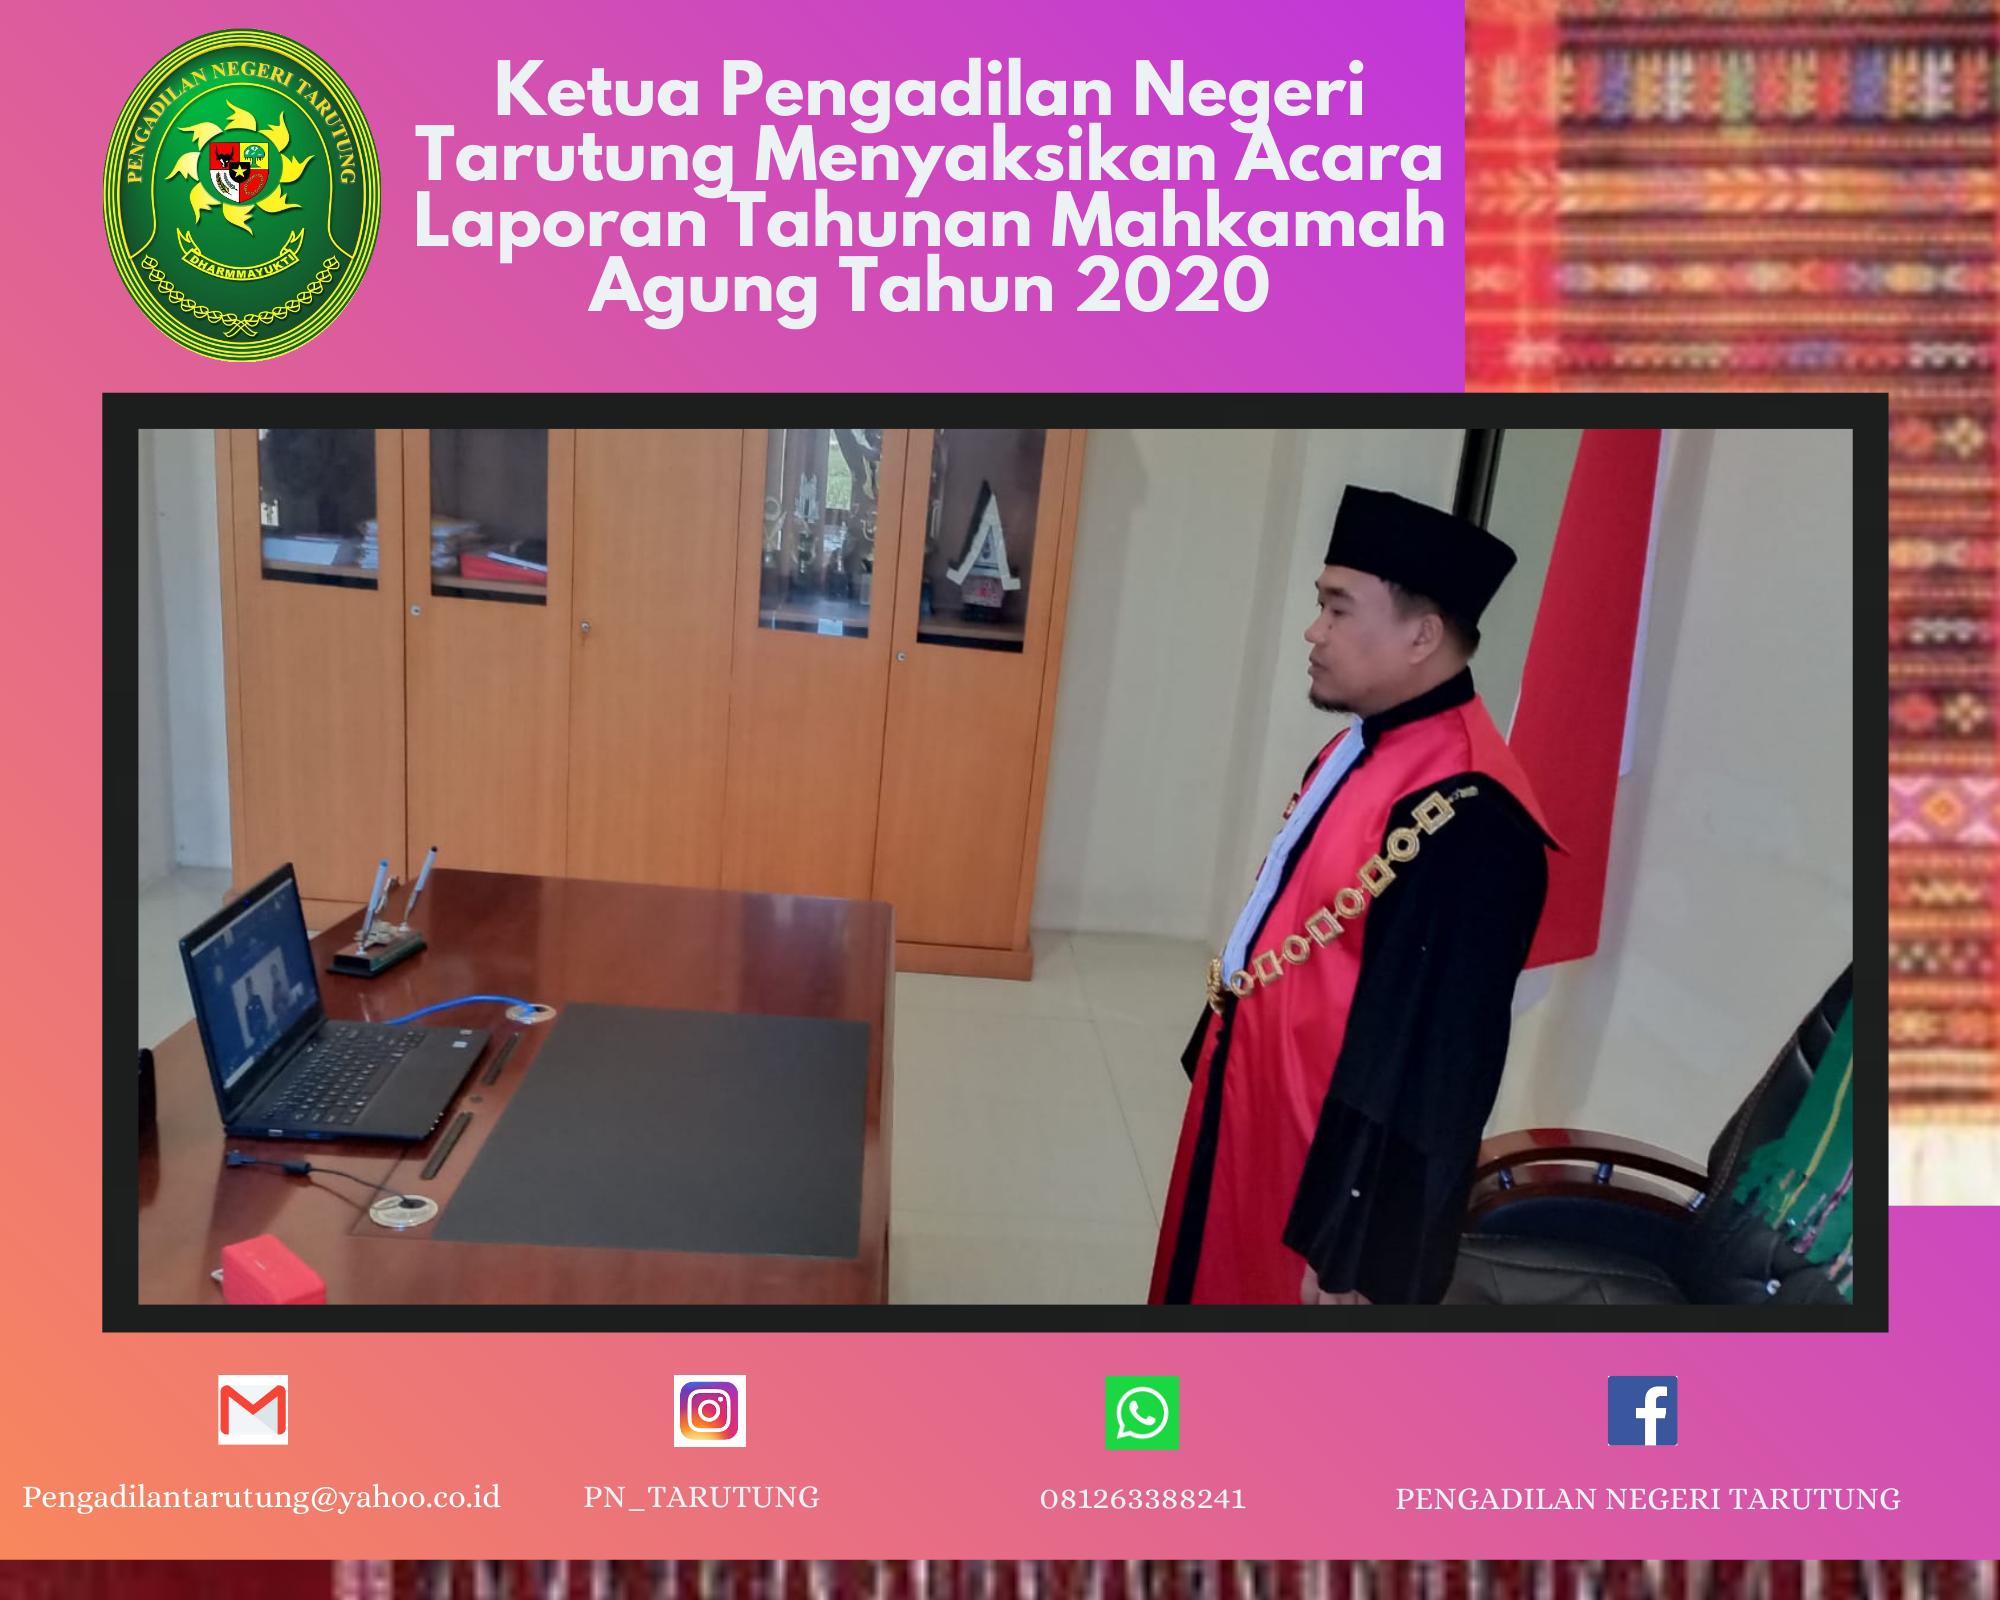 Partisipasi Mengikuti Acara Laporan Tahunan Mahkamah Agung Republik Indonesia Tahun 2020.